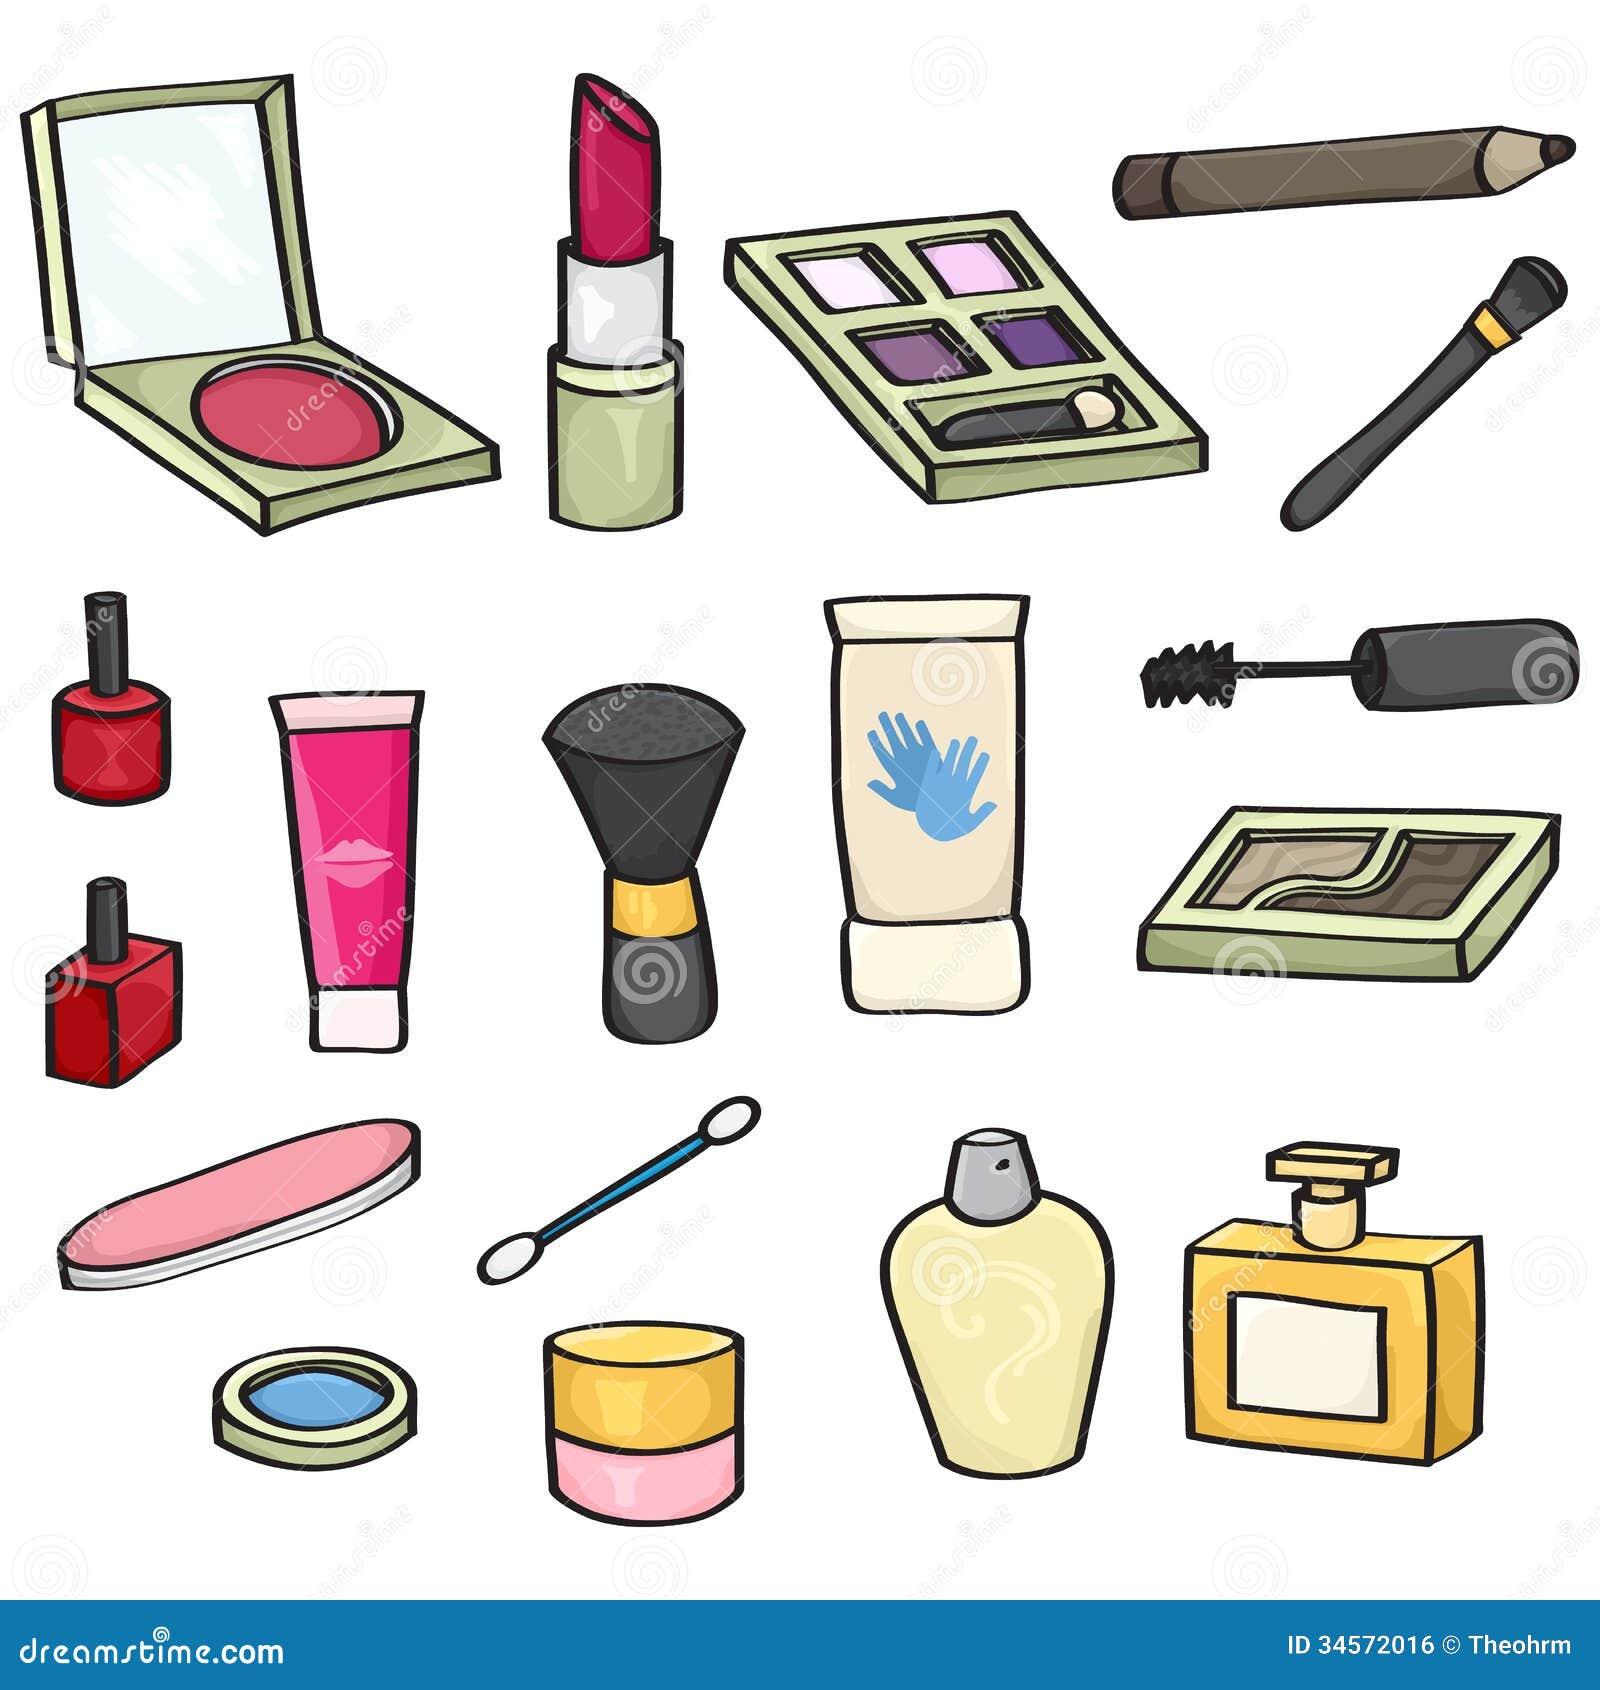 animated makeup wallpaper - photo #19